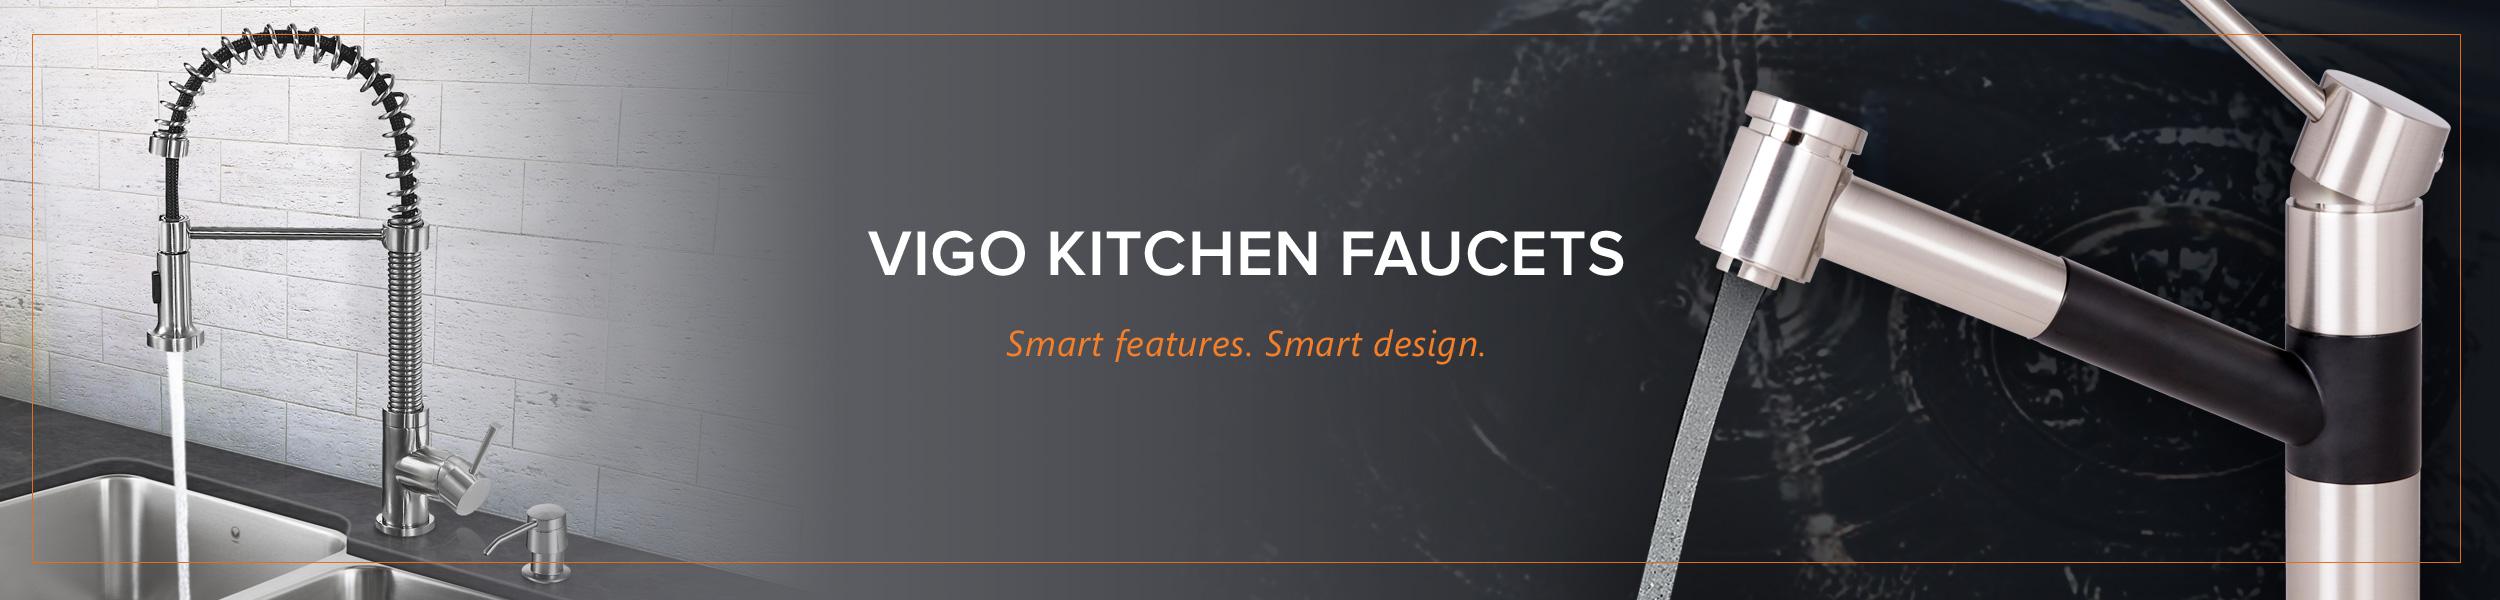 kitchen faucets faucet kitchen Kitchen Faucets